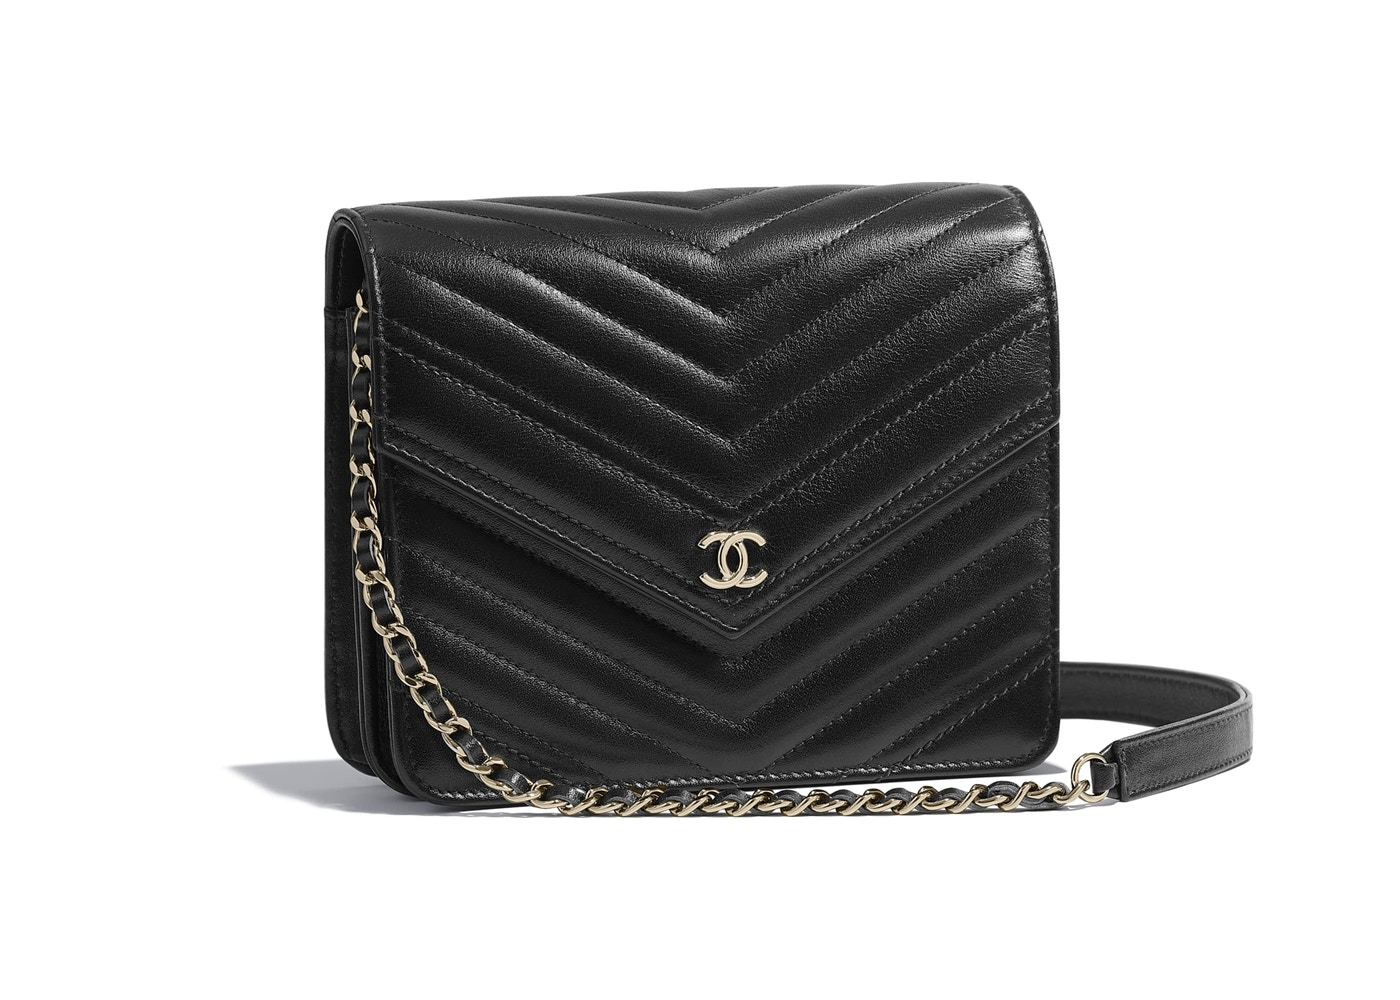 3d3a2c99377c Chanel Wallet On Chain Chevron Calfskin Gold-tone Black